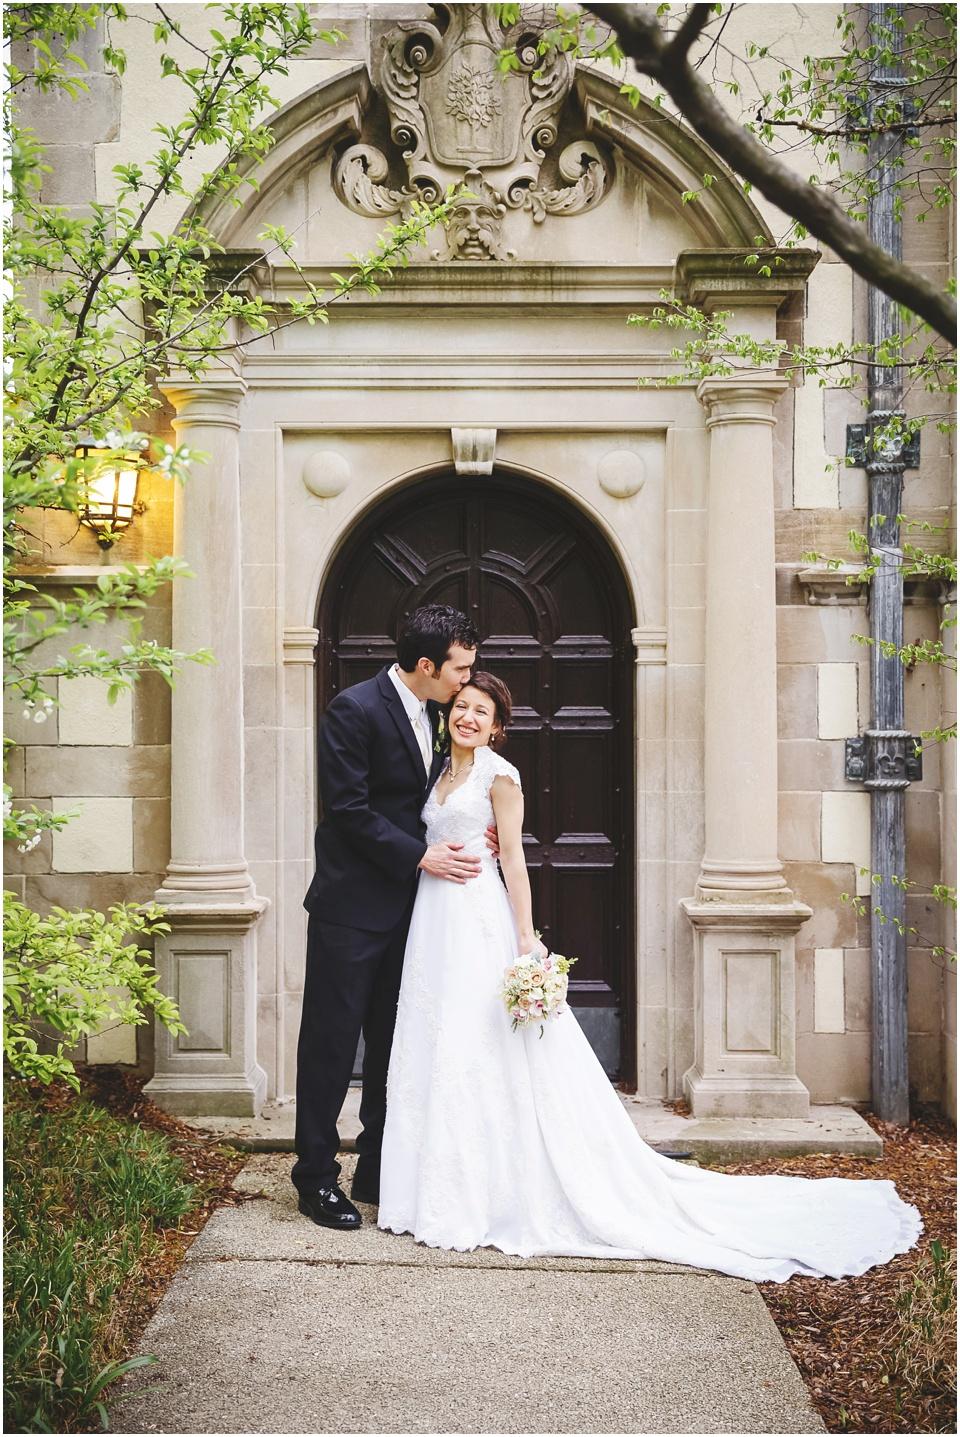 Bloomington Wedding Photography By Rachael Schirano